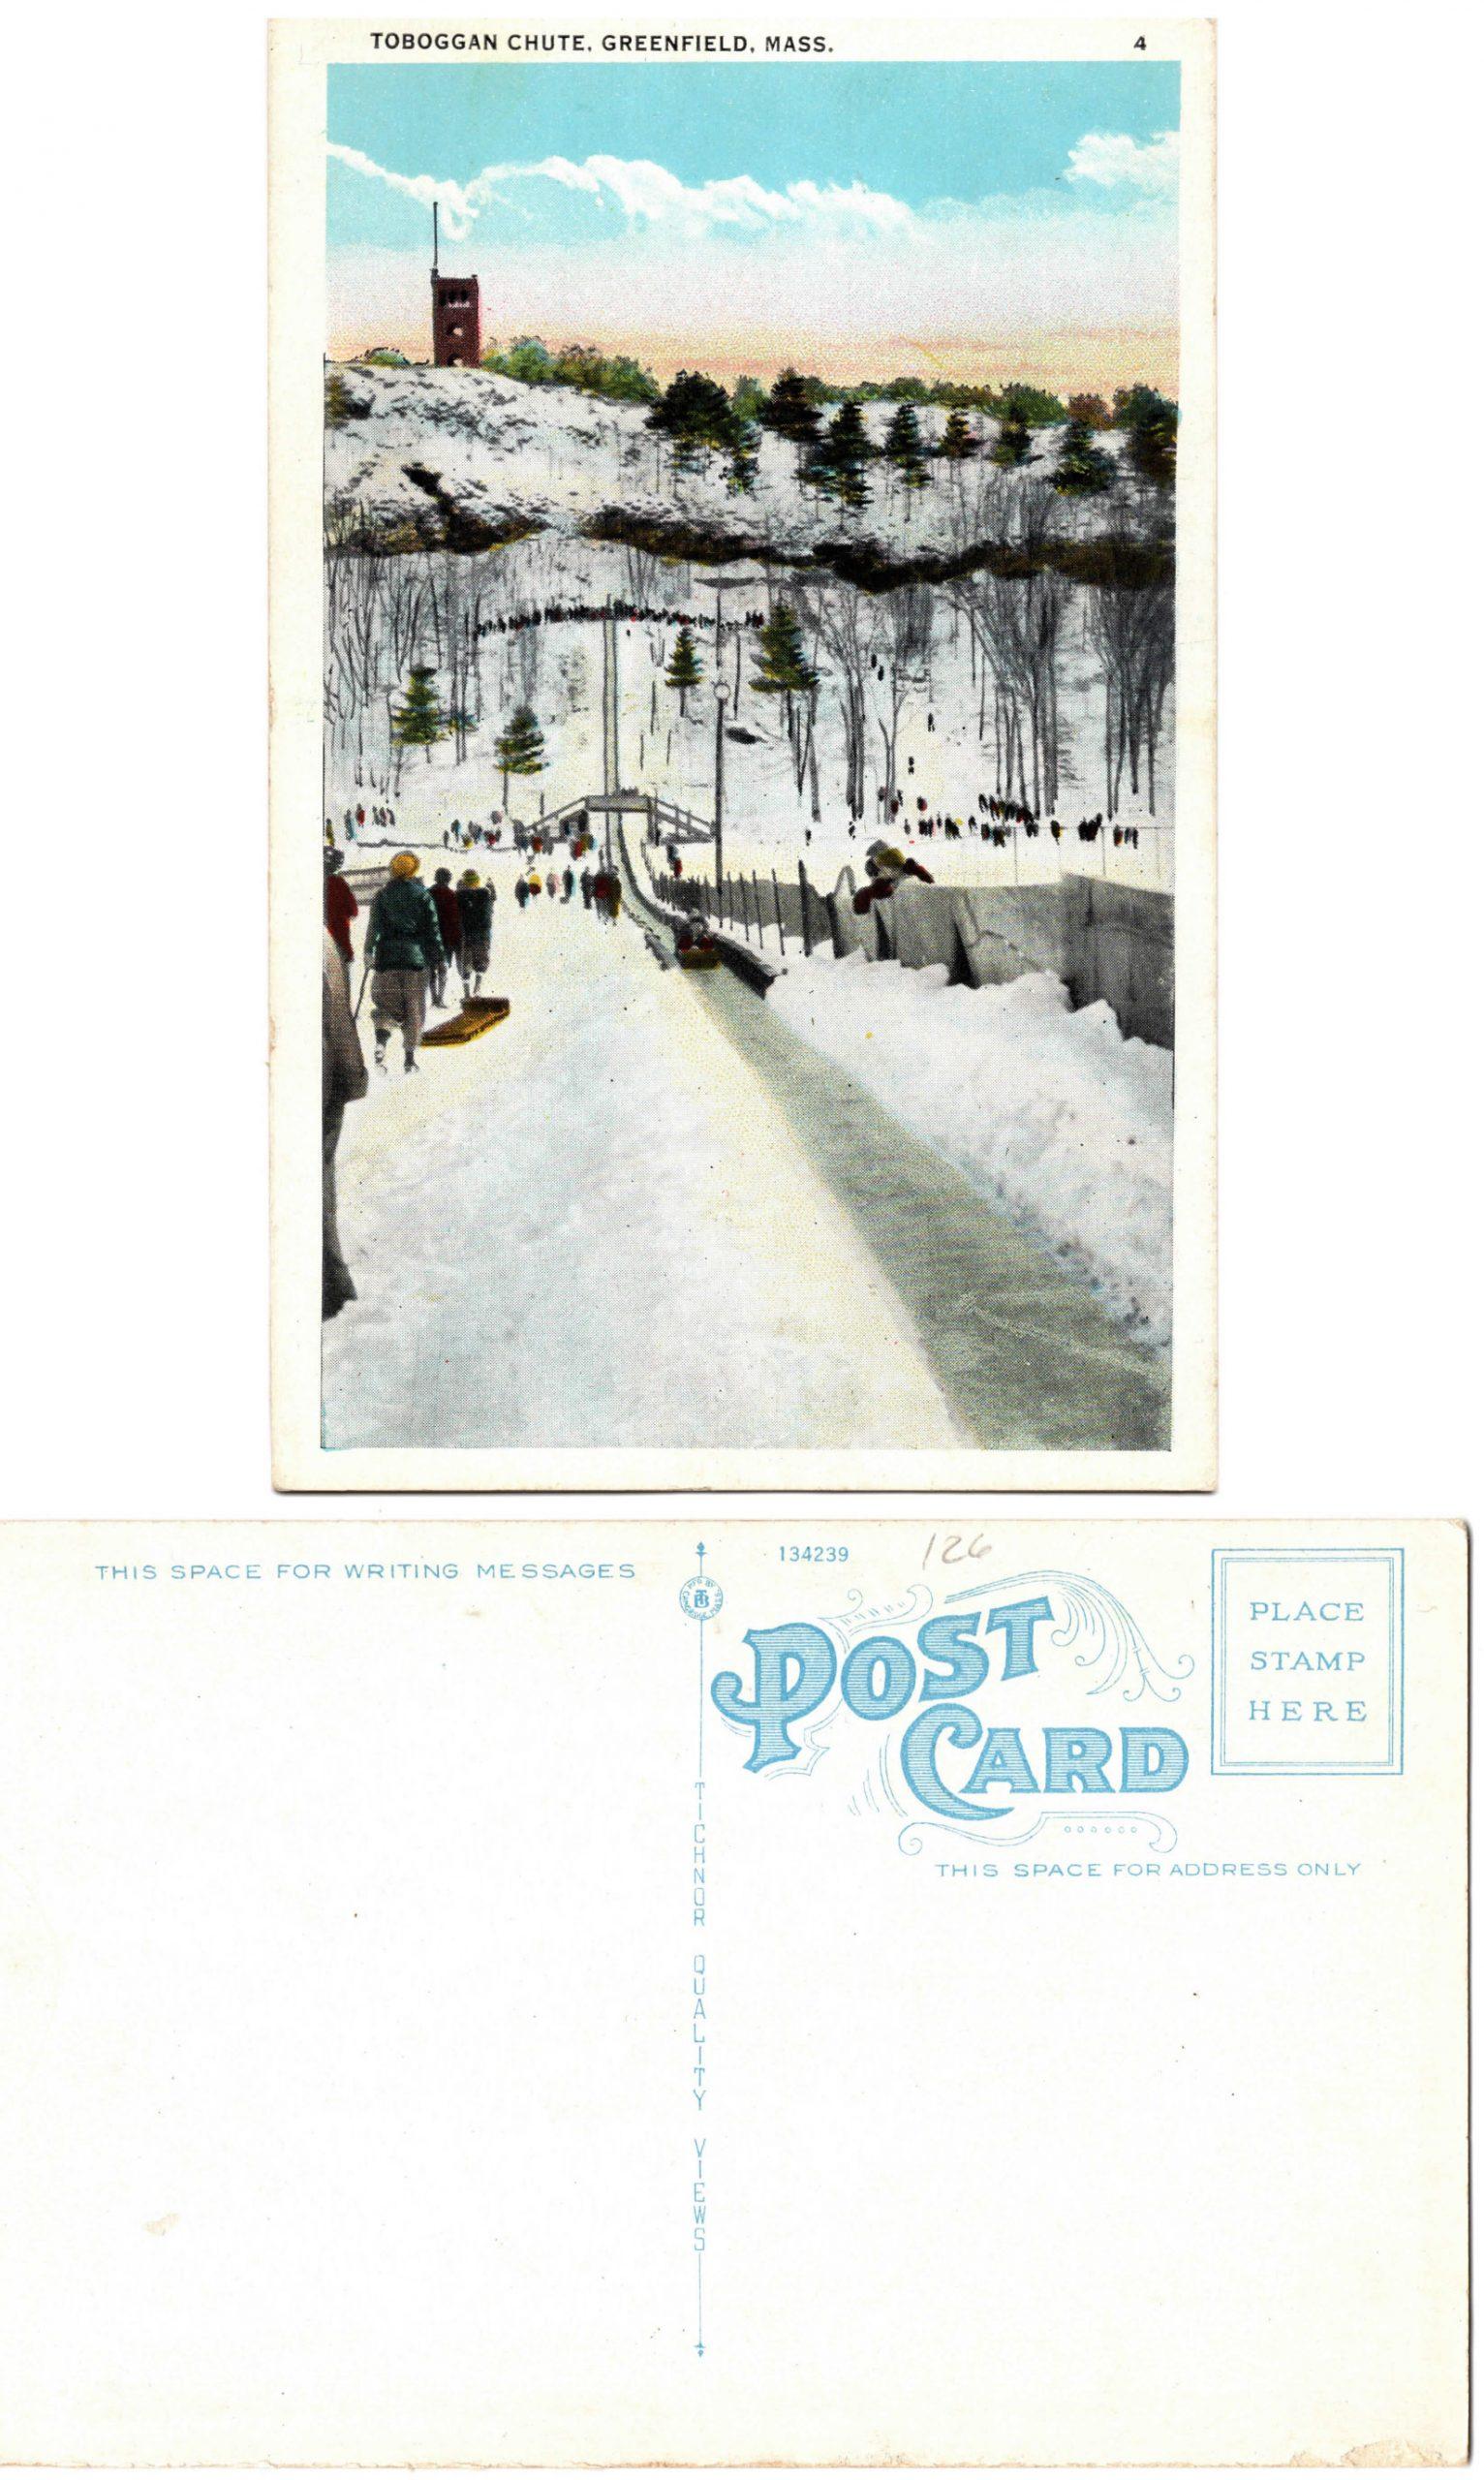 historic-Greenfield-postcard-7